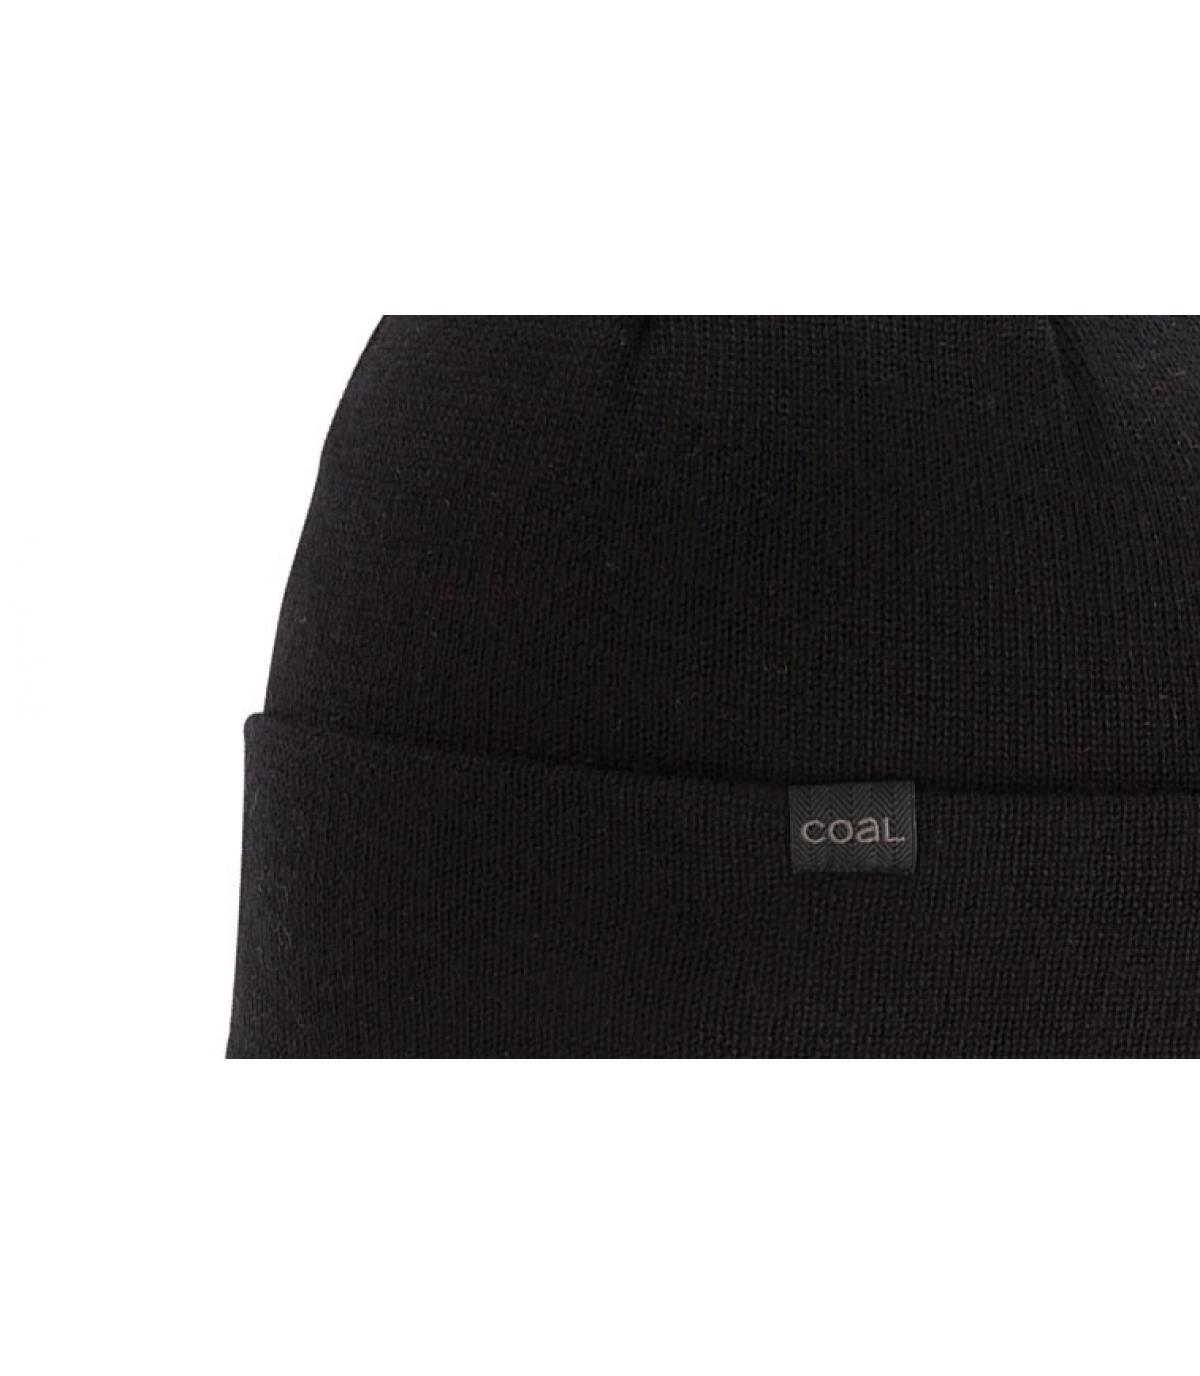 Coal black merino beanie - The Mesa black by Coal. Headict 1c7c798fdb40